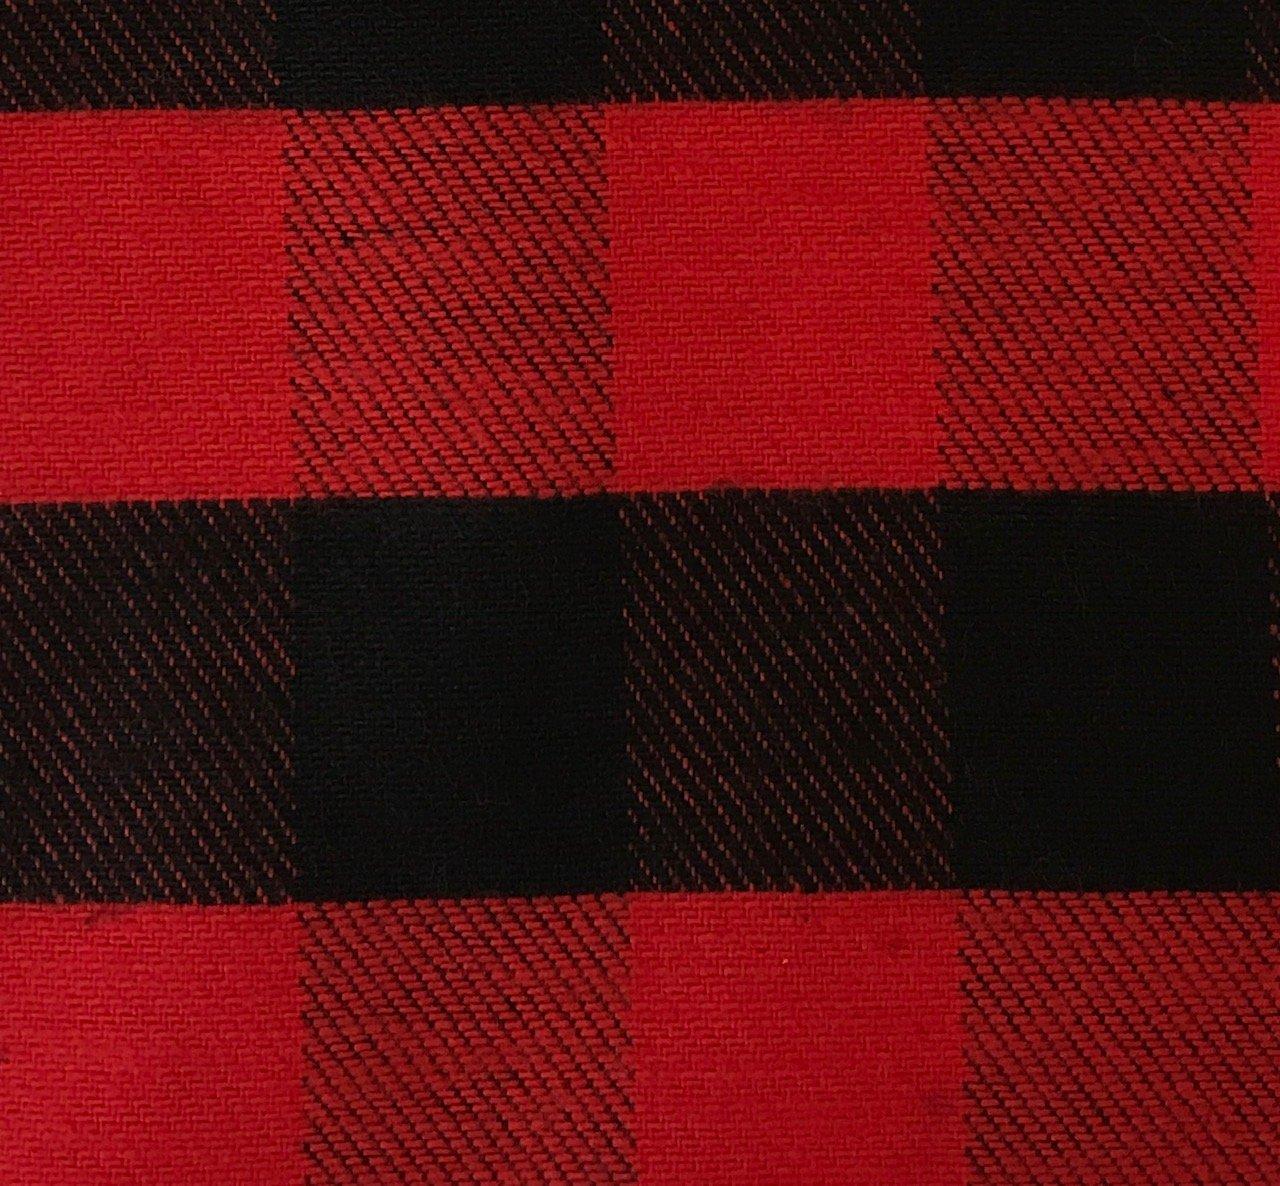 Plaid Flannel  - Red/Black Check